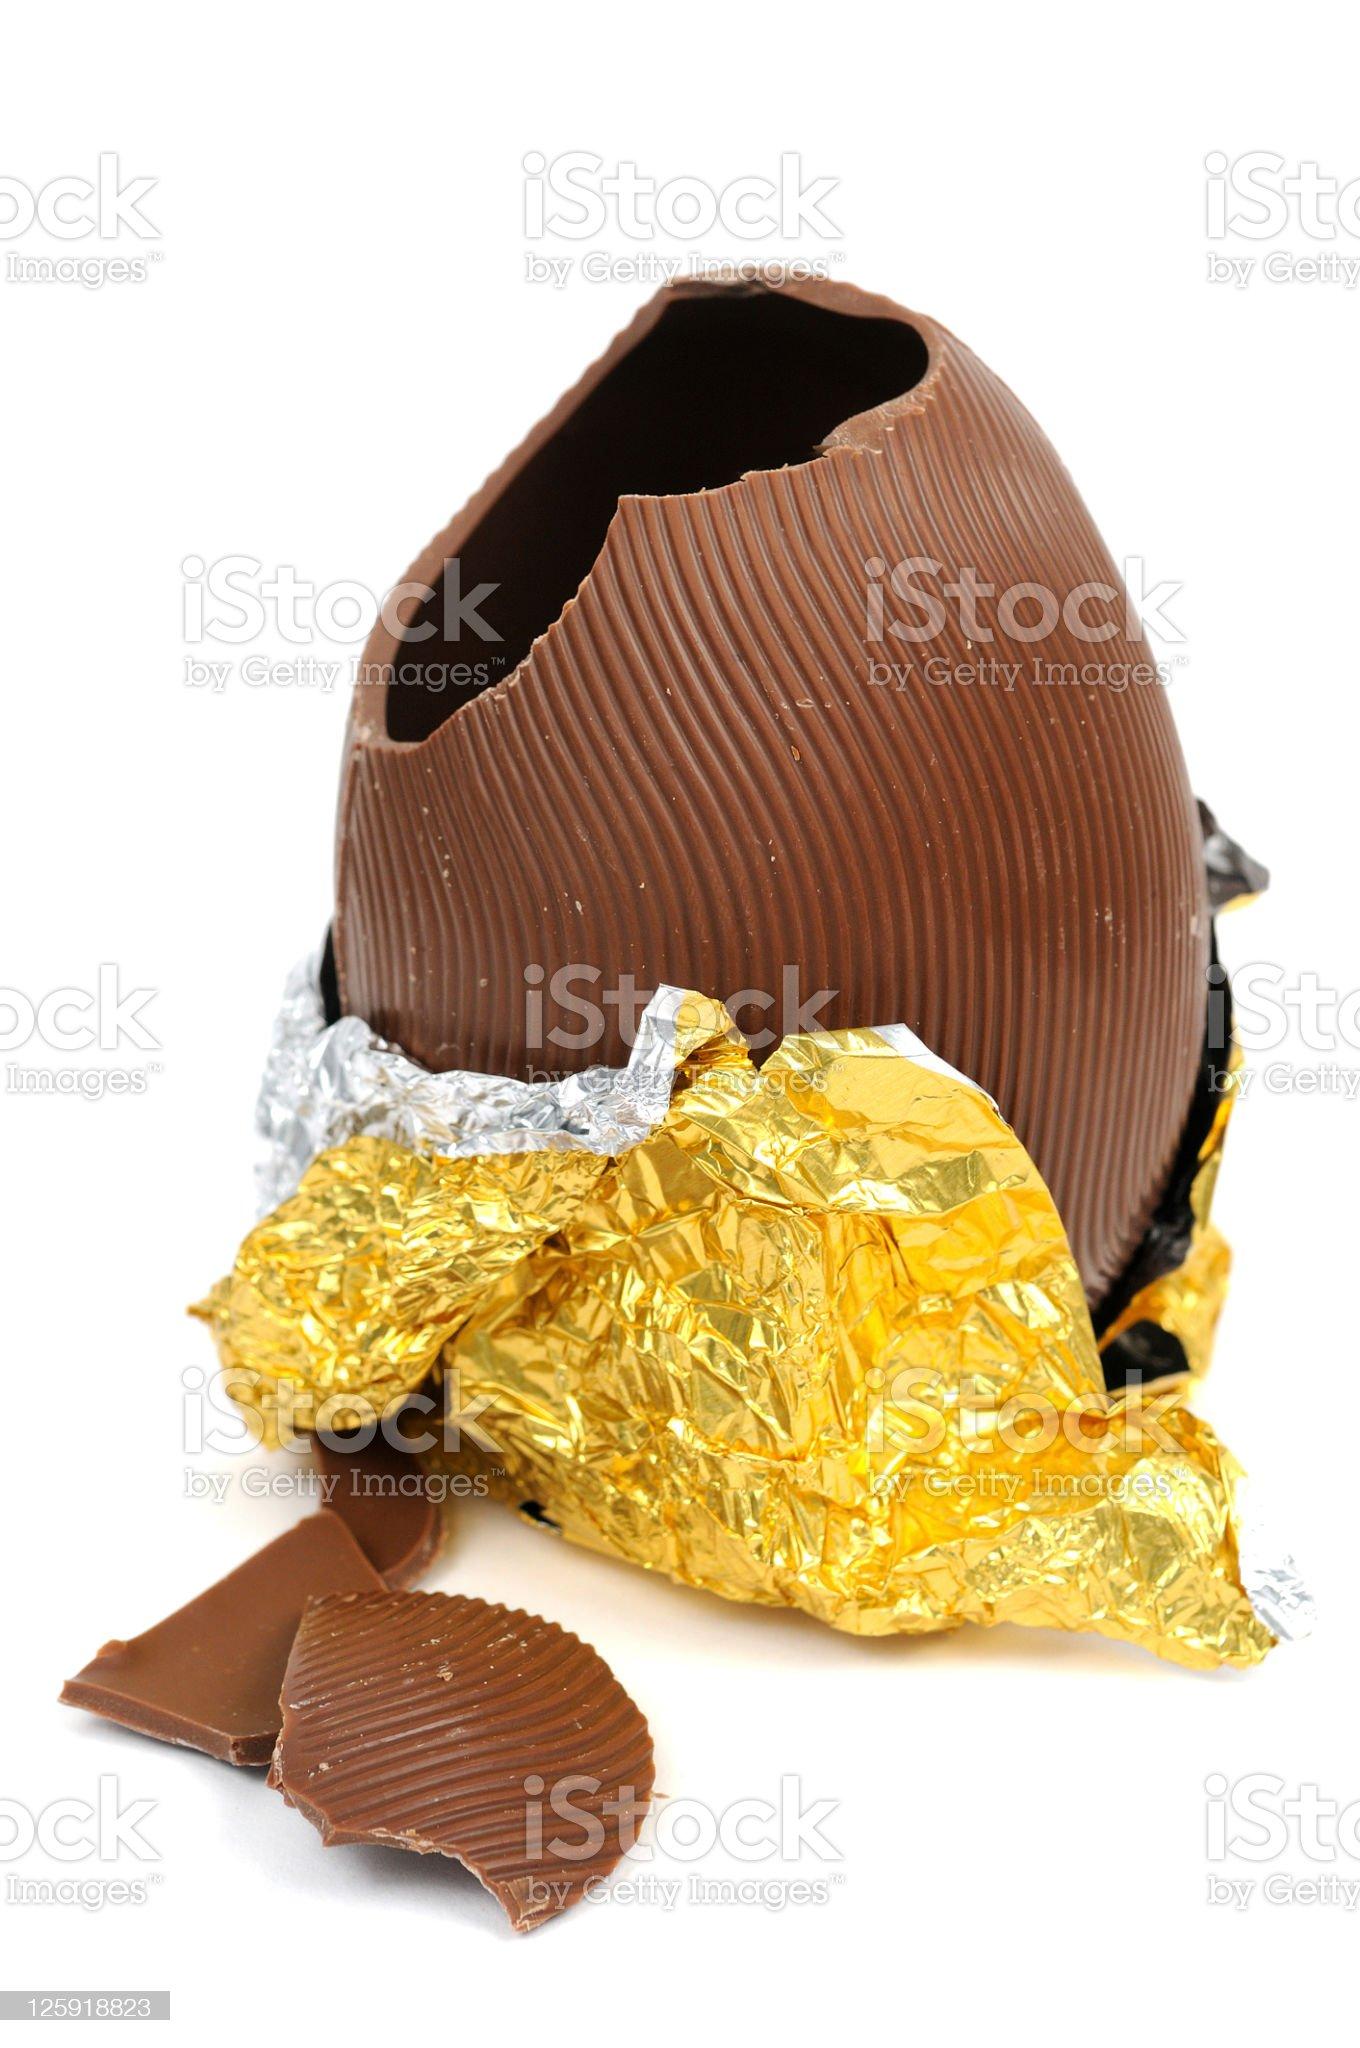 Broken Chocolate Easter Egg royalty-free stock photo